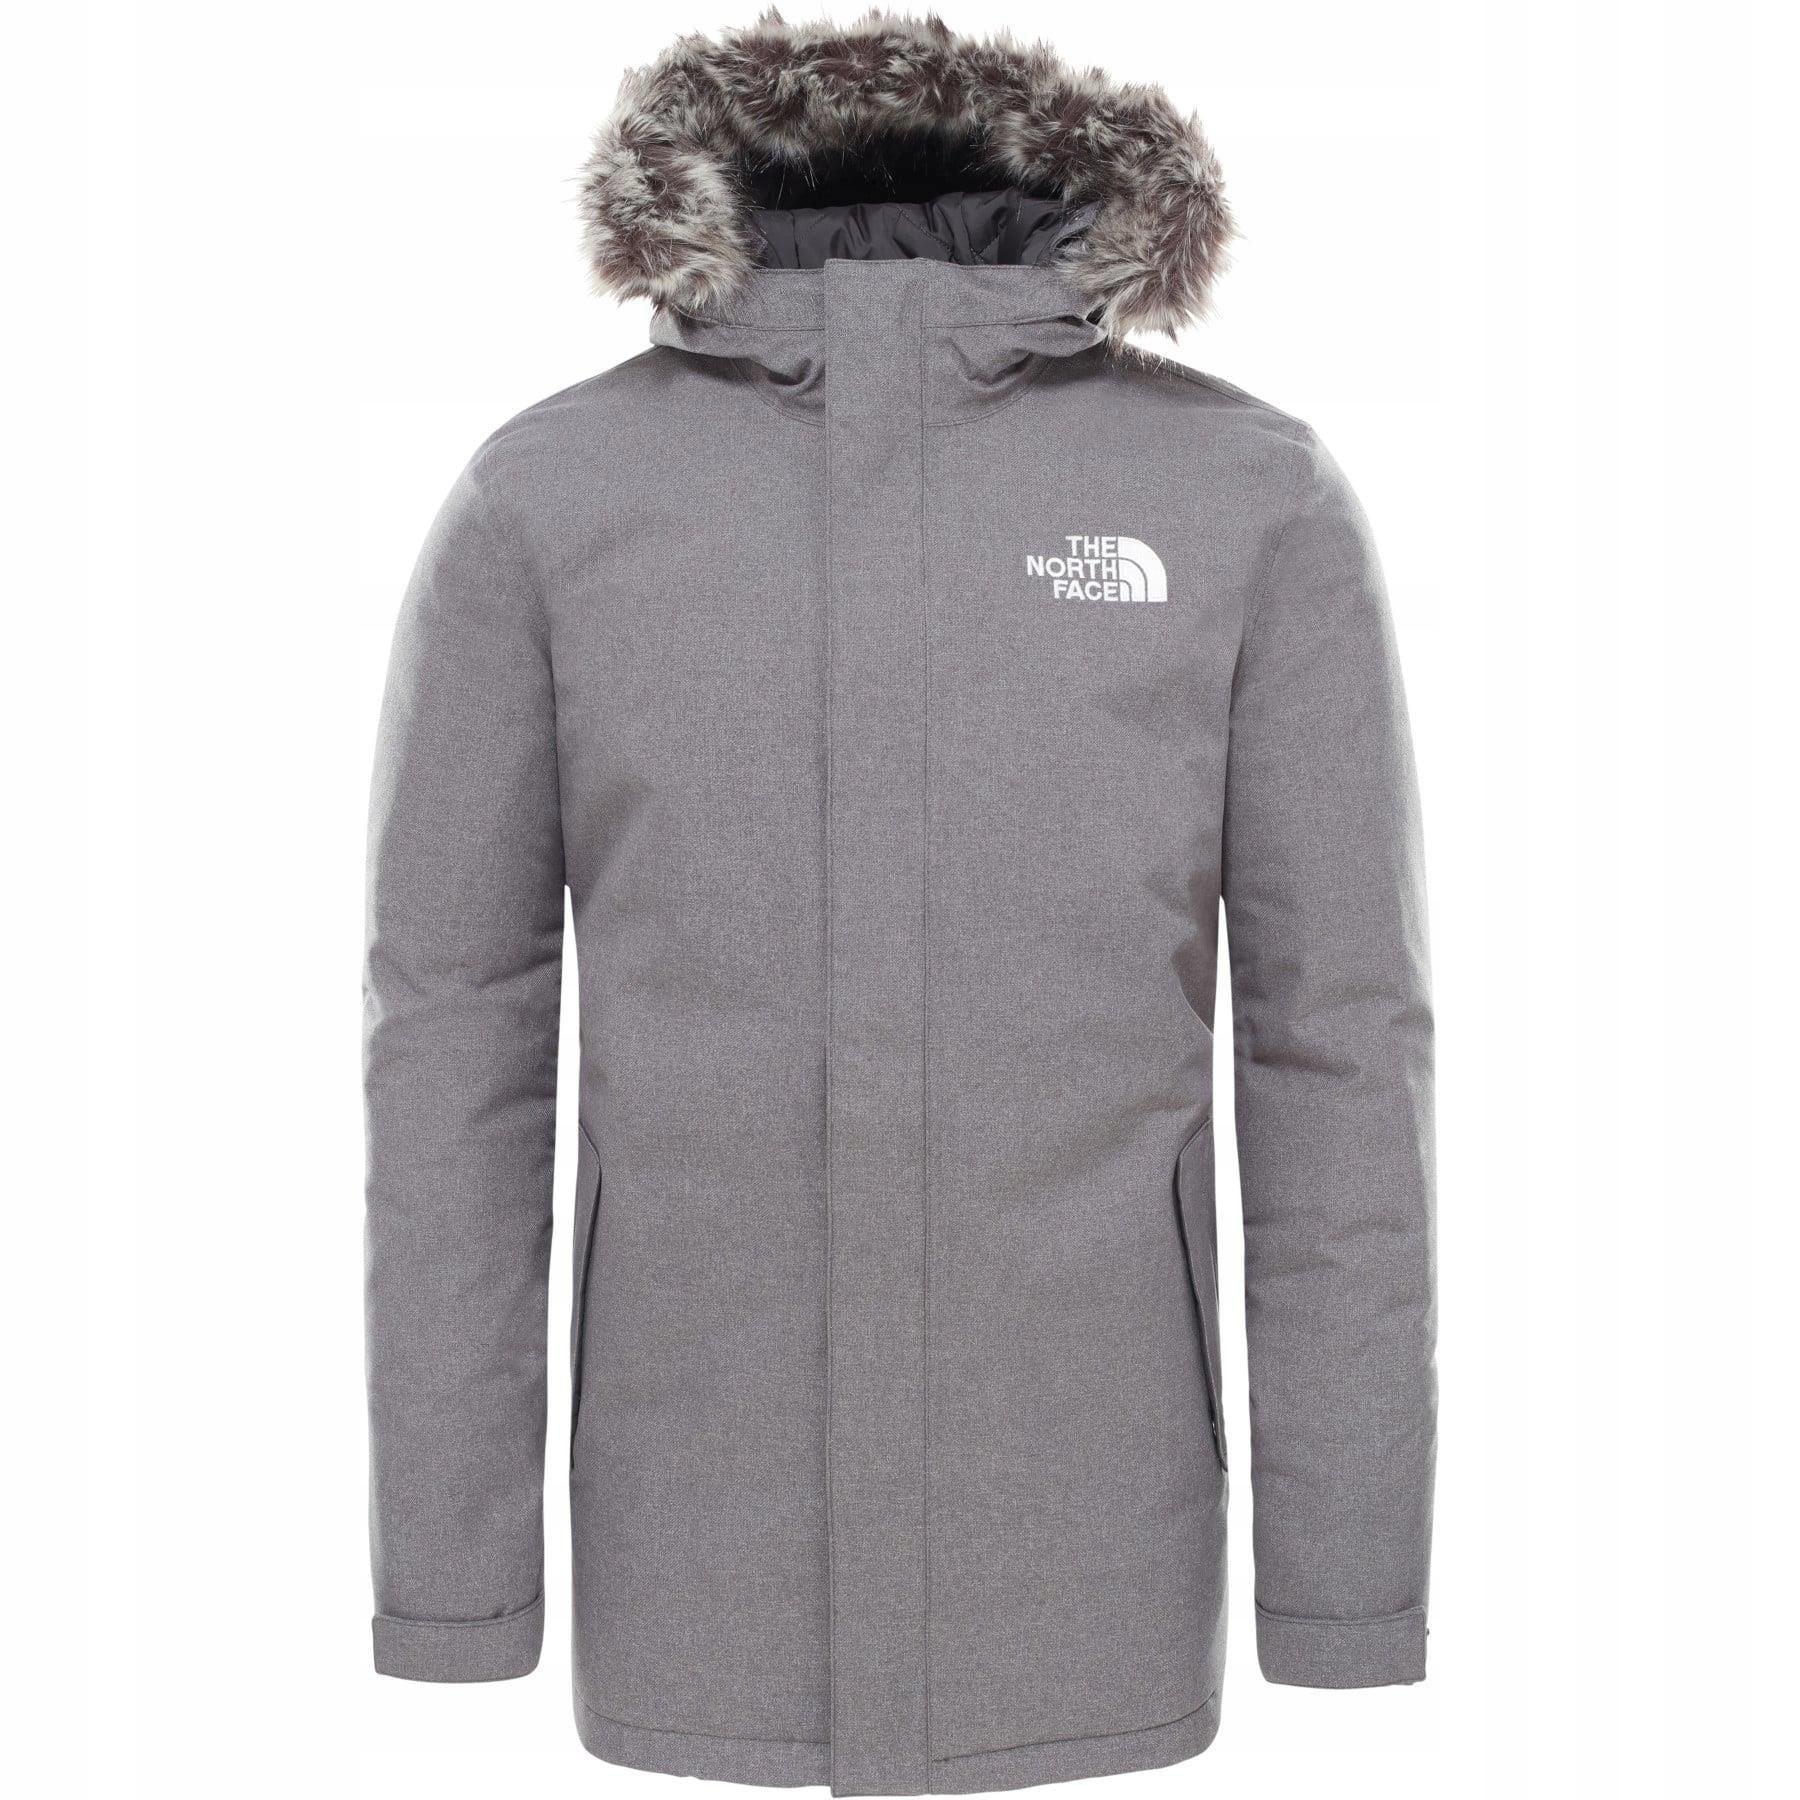 Куртка The North Face Zaneck, tnf medium grey heather, L фото